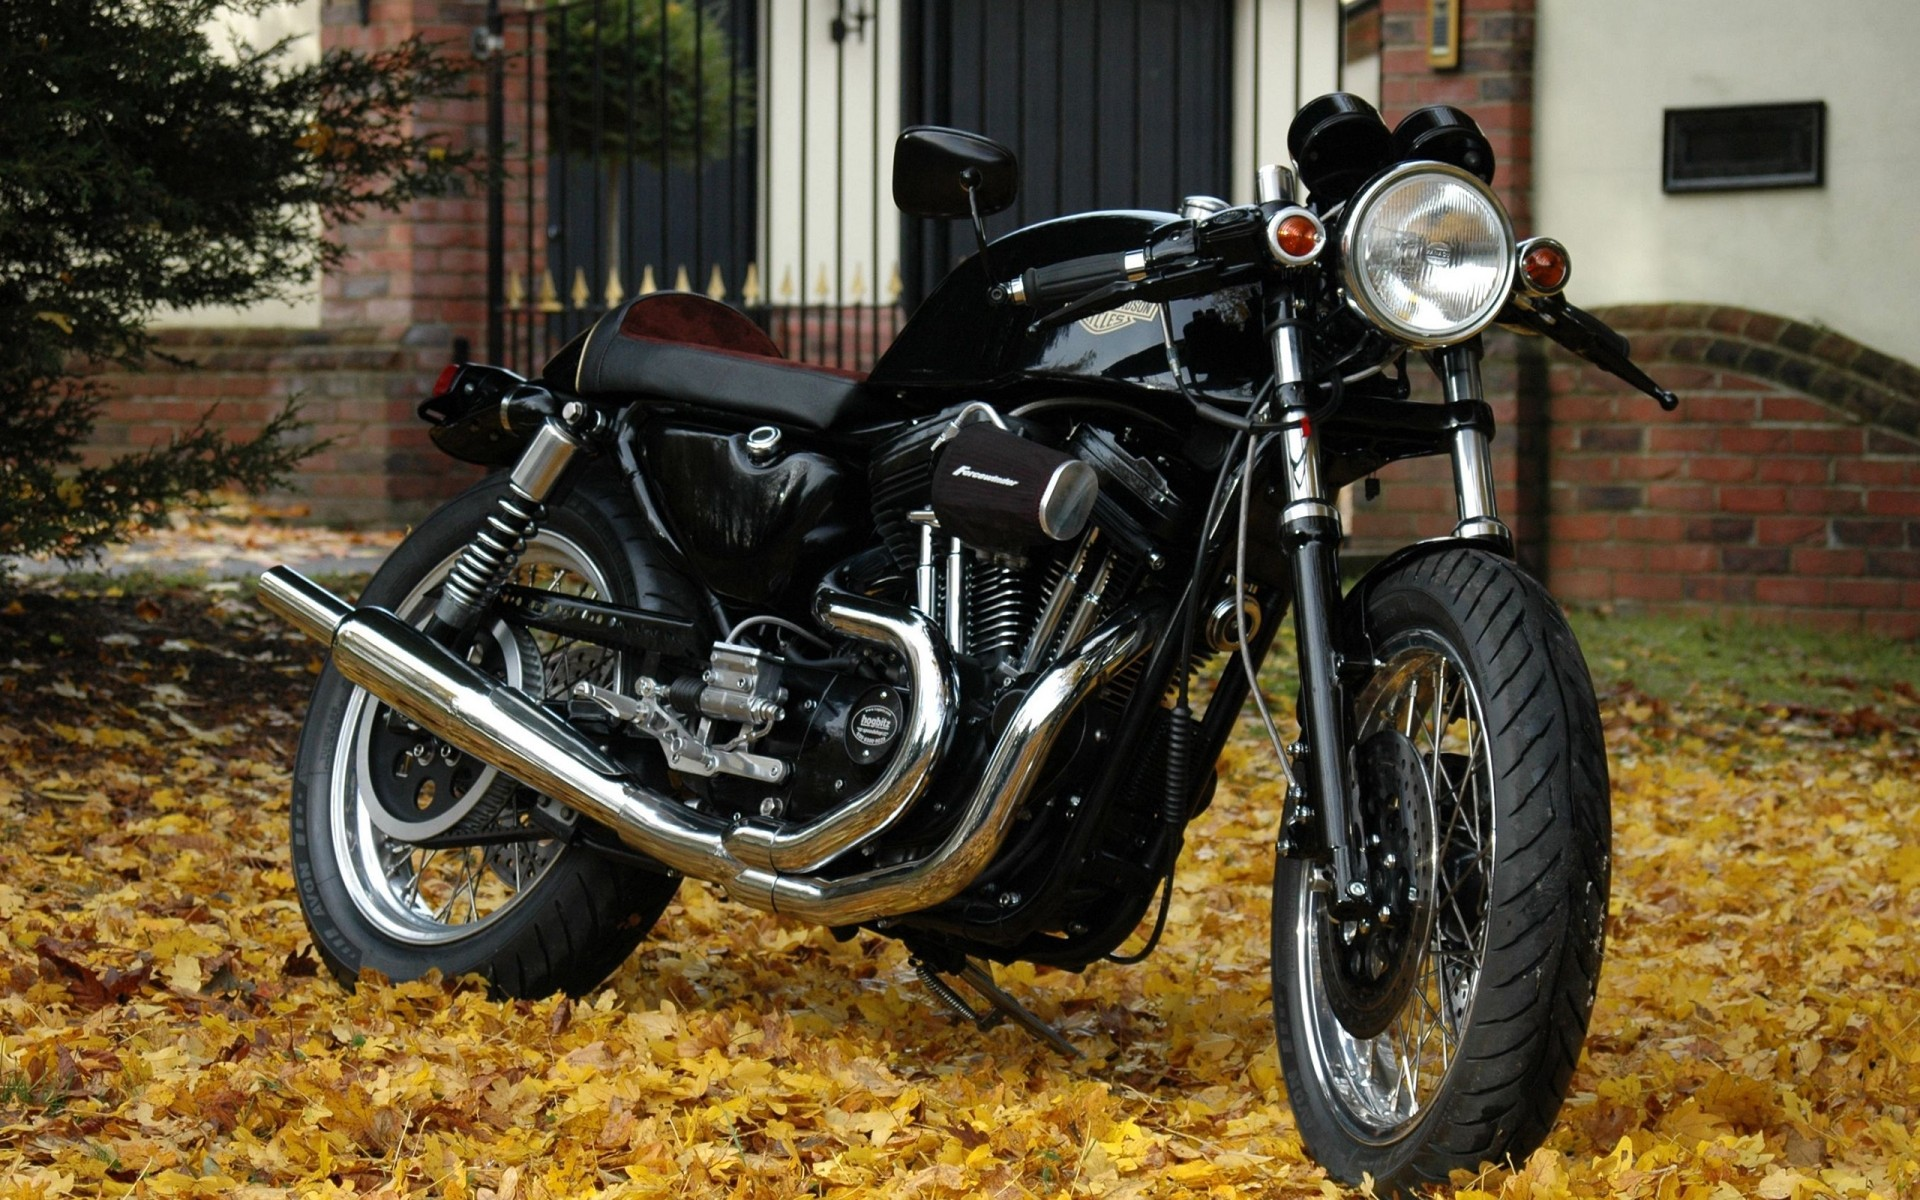 фото мотоцикла харлей дэвидсон накладки